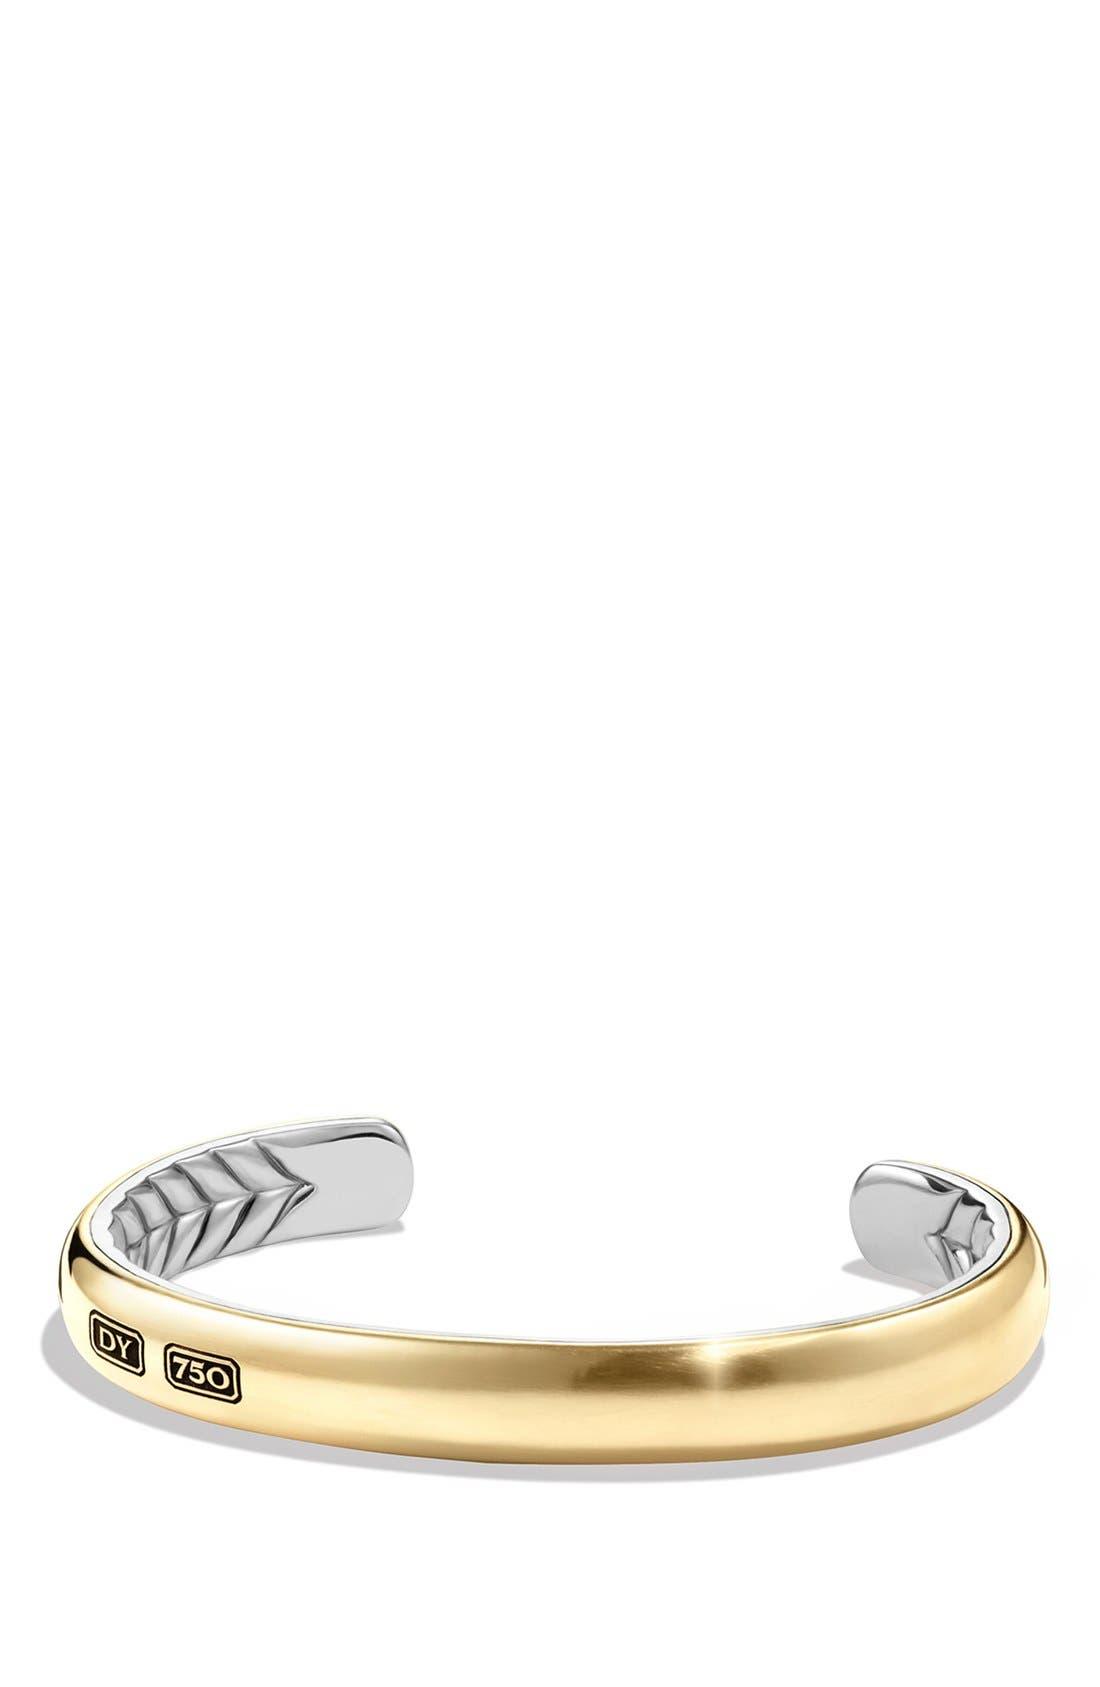 Main Image - David Yurman 'Streamline' Cuff Bracelet with 18K Gold